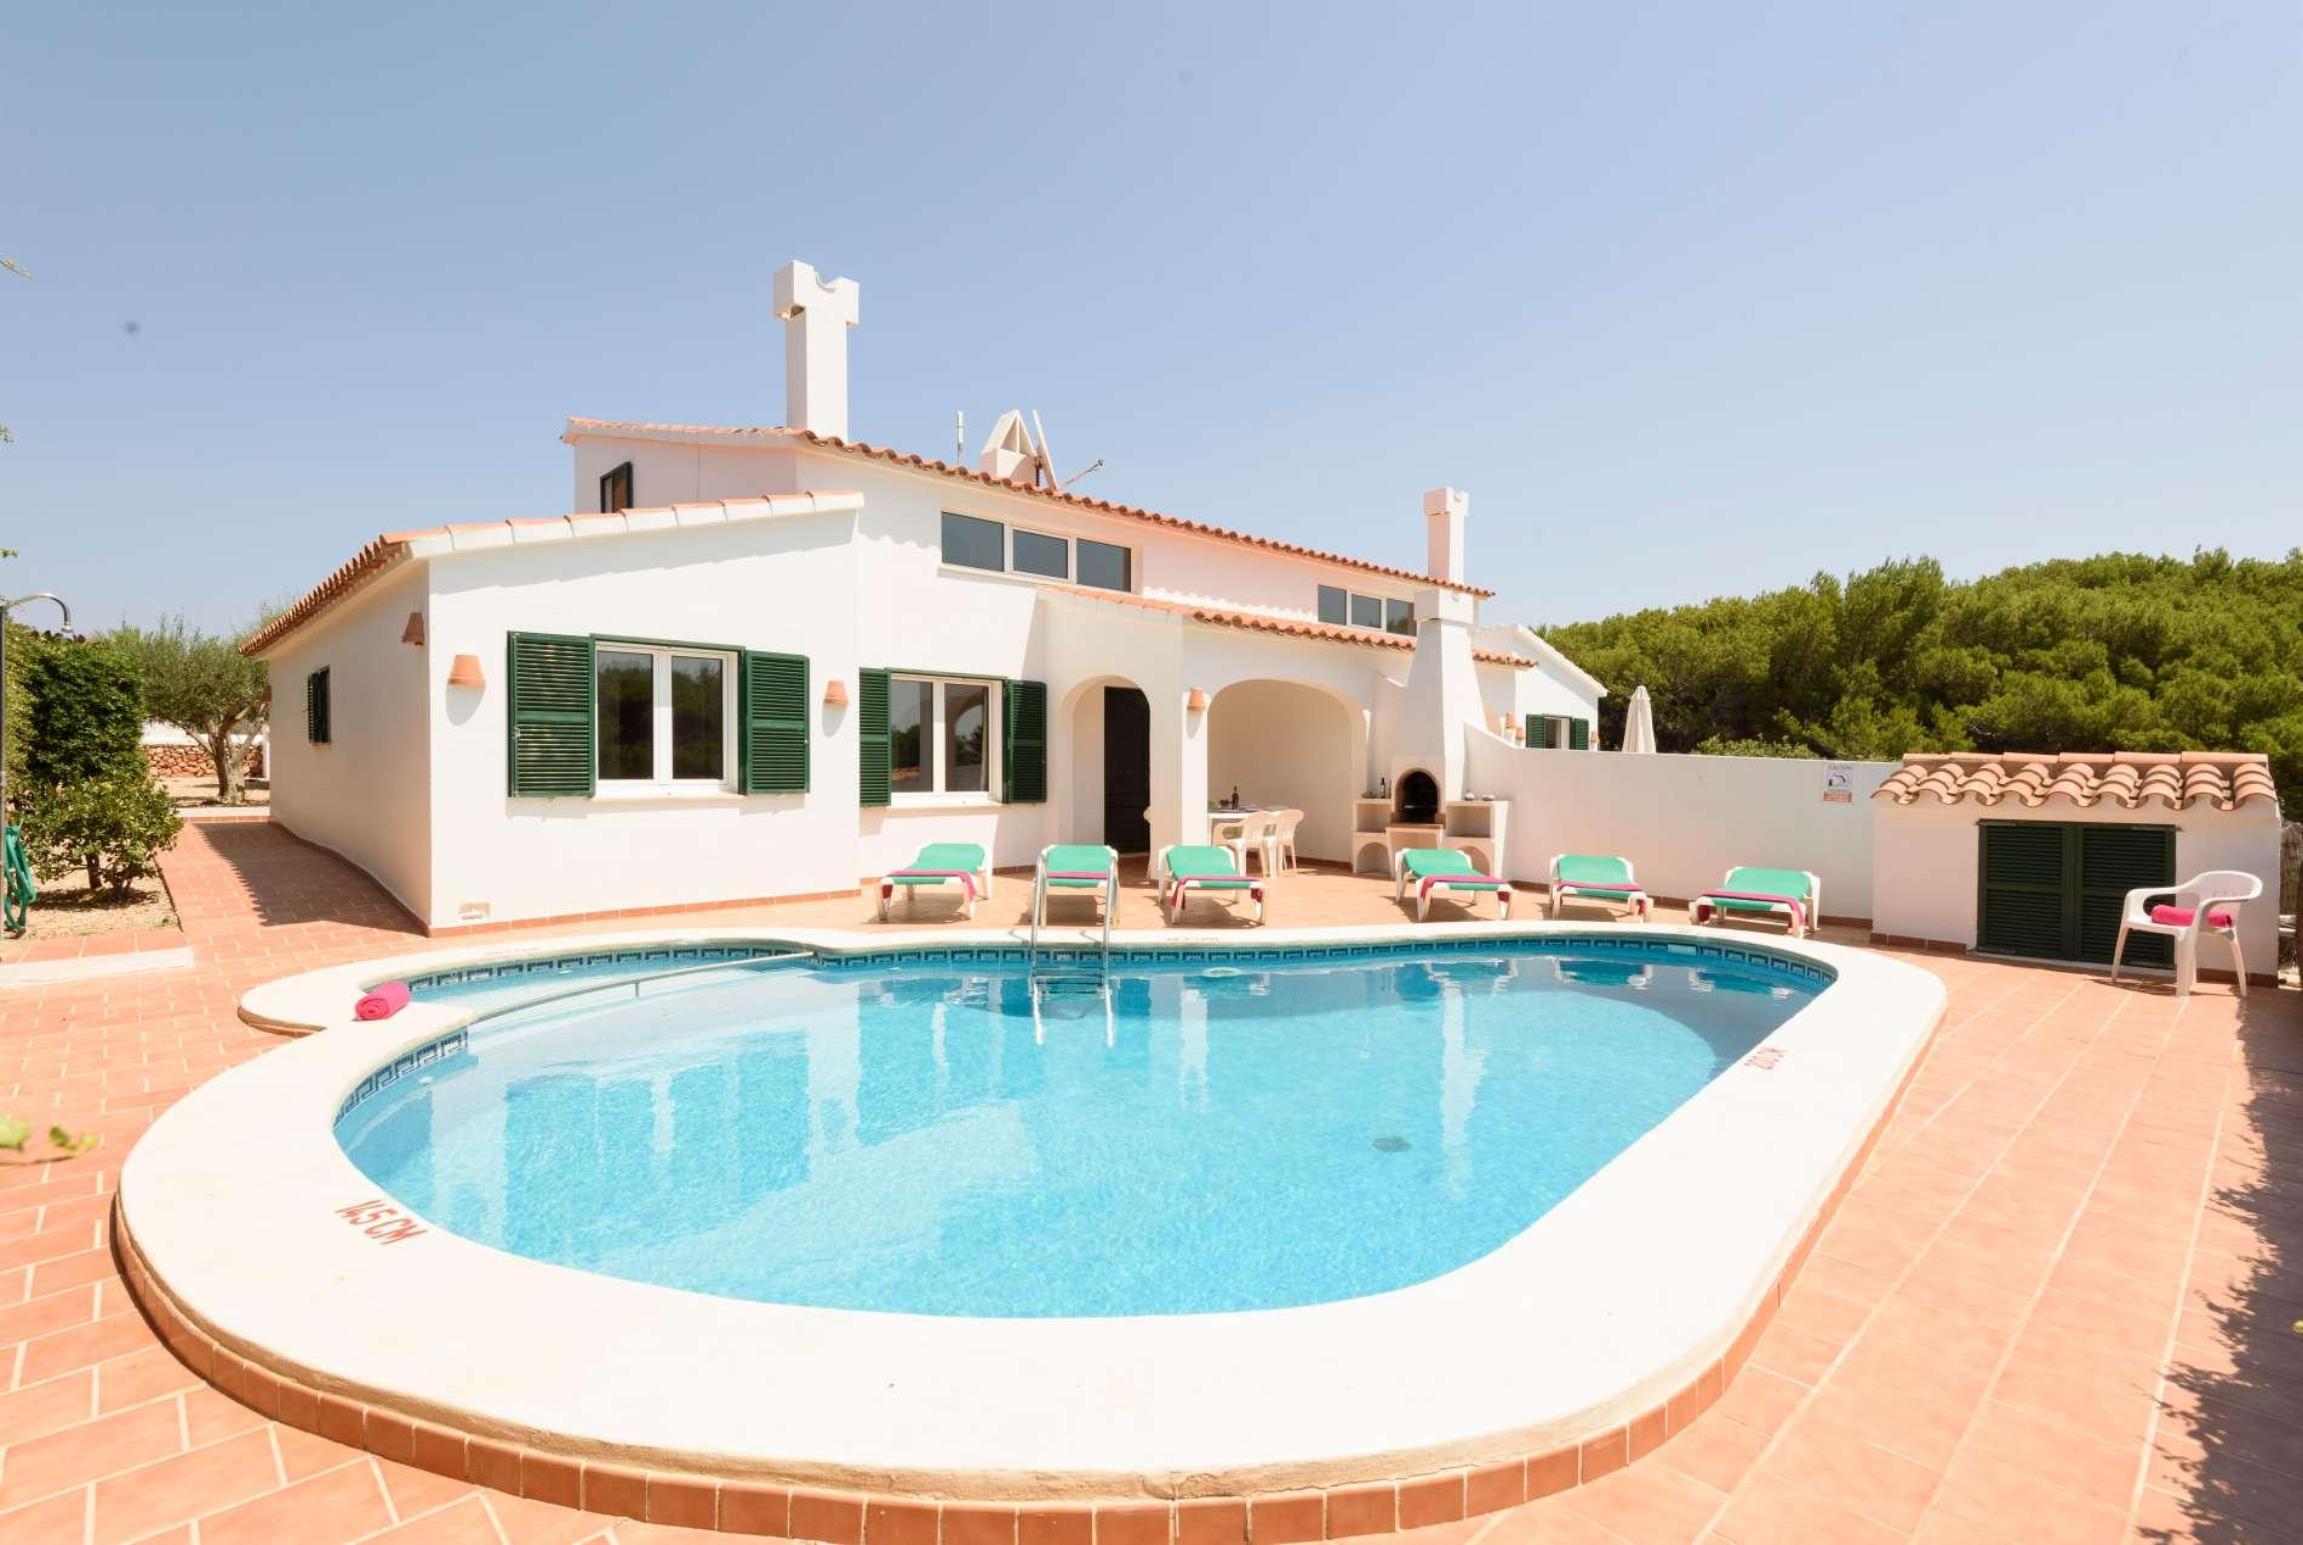 Ferienhaus Eulalia II (2653368), Arenal De'N Castell, Menorca, Balearische Inseln, Spanien, Bild 14